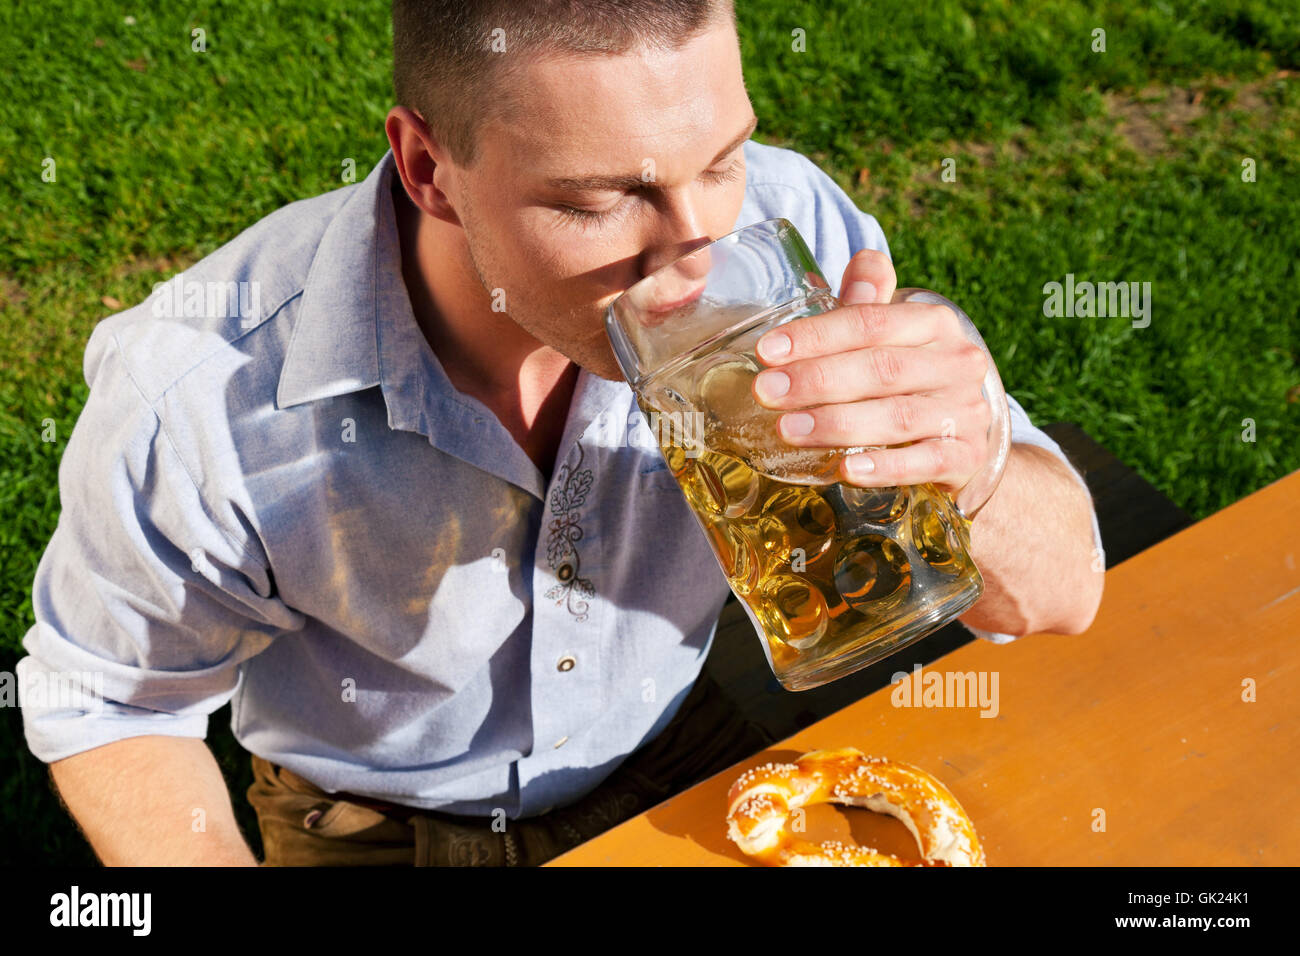 man in lederhosen drinking beer - Stock Image